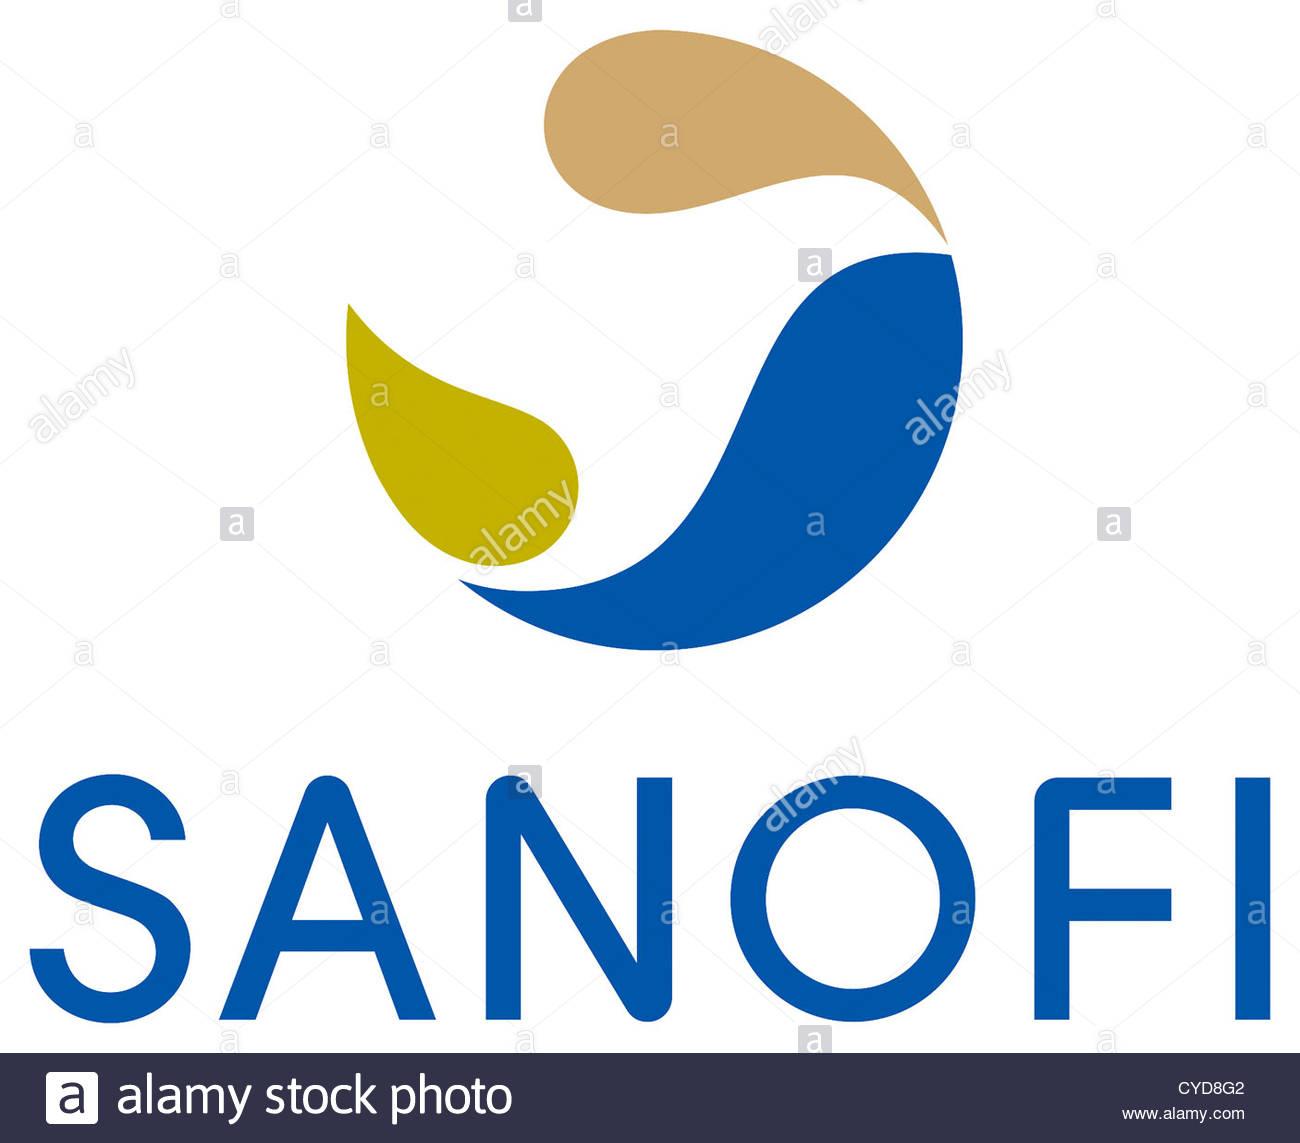 Sanofi (SNY) Stock Price, News, Quote & History - Yahoo Finance